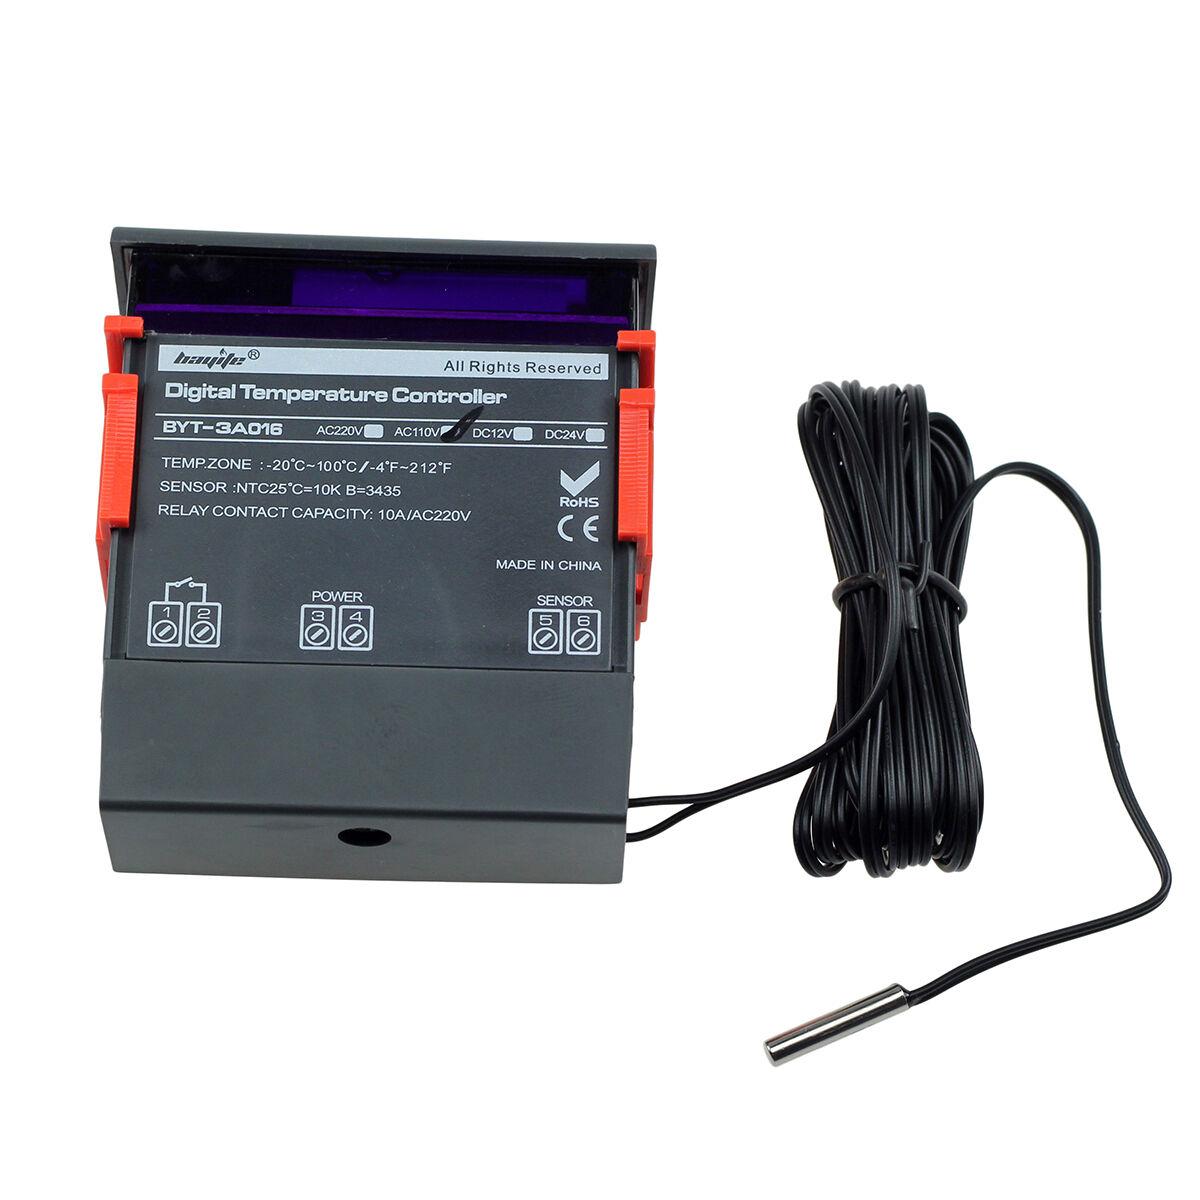 Купить BAYITE Digital Temperature Controller - 10A 110V Digital Temperature Controller Temp Sensor Thermostat Control Relay US